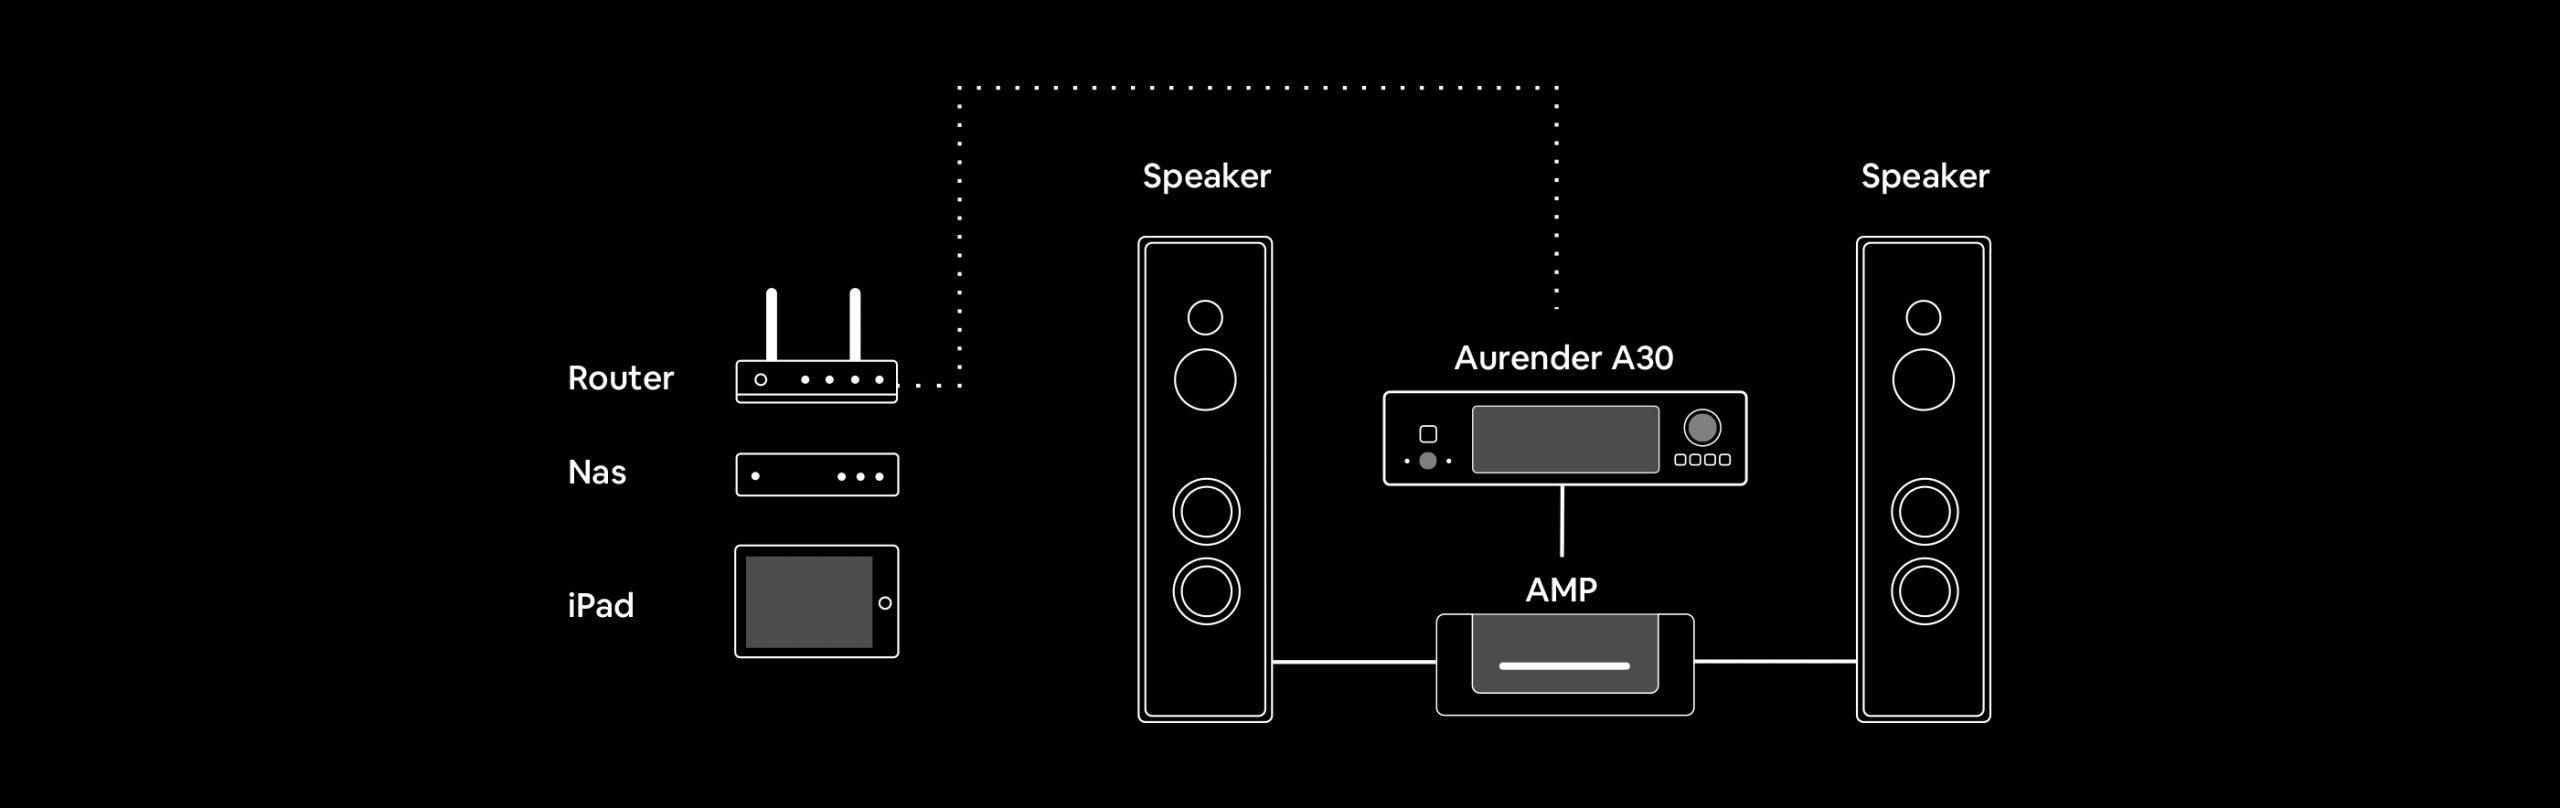 aurender a30 system configuration